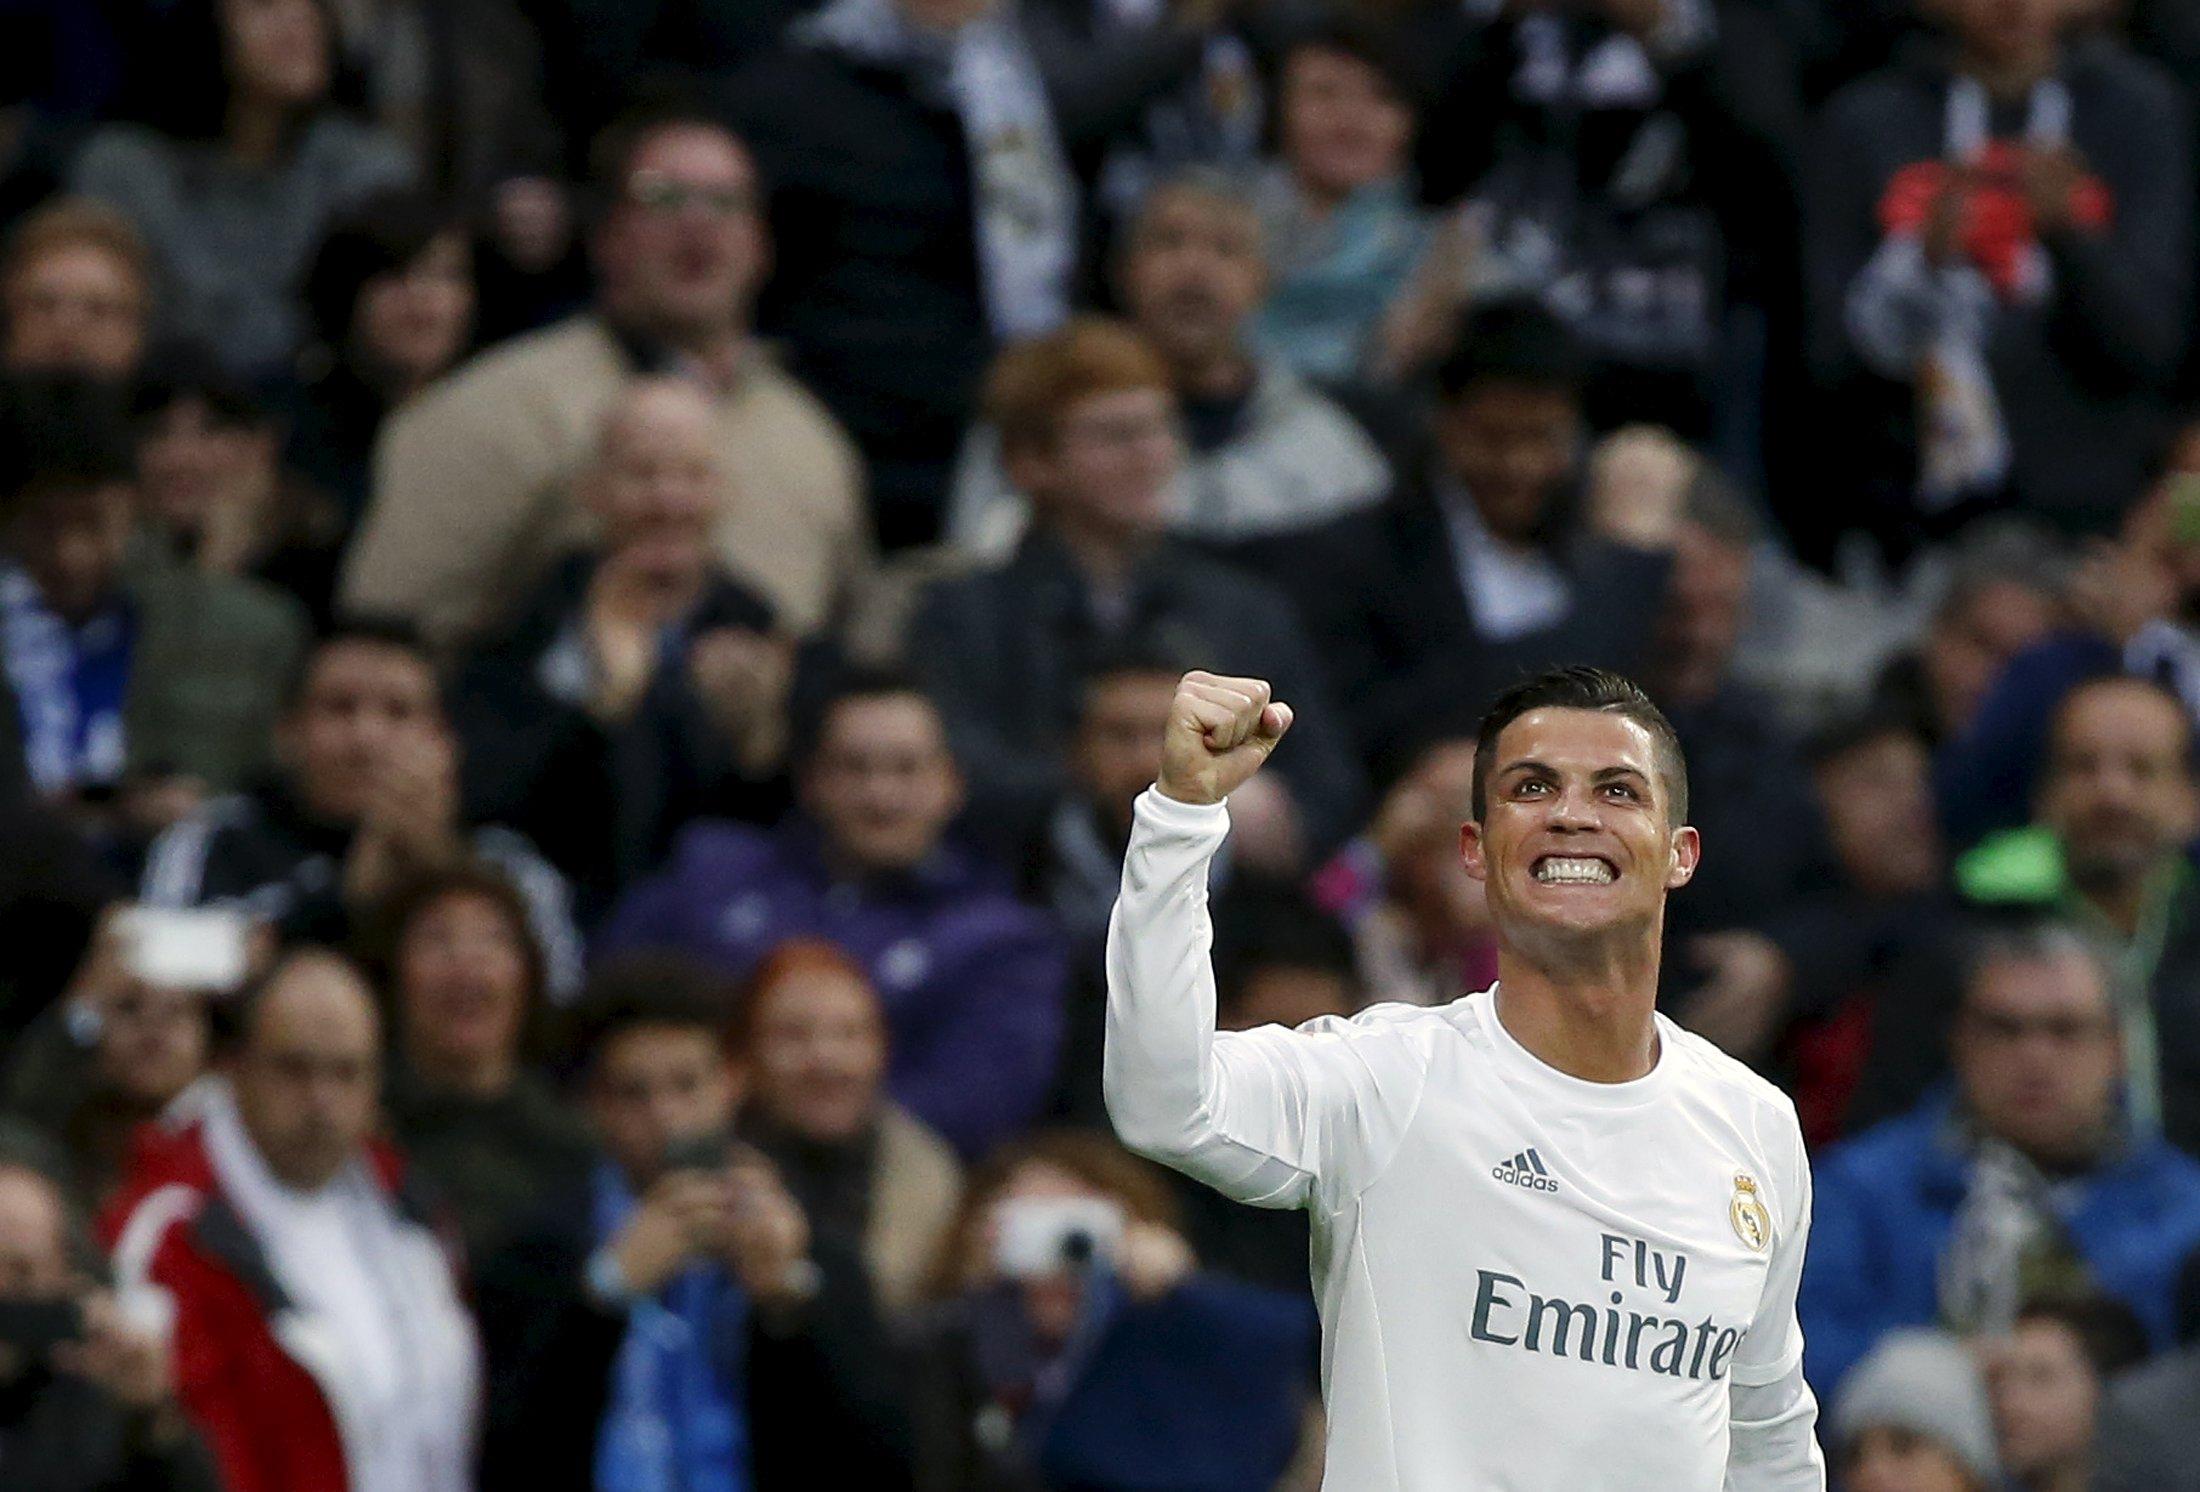 Real Madrid's Cristiano Ronaldo celebrates his second goal against Real Sociedad at Santiago Bernabau Stadium on Wednesday, December 30, 2015. Photo: Reuters